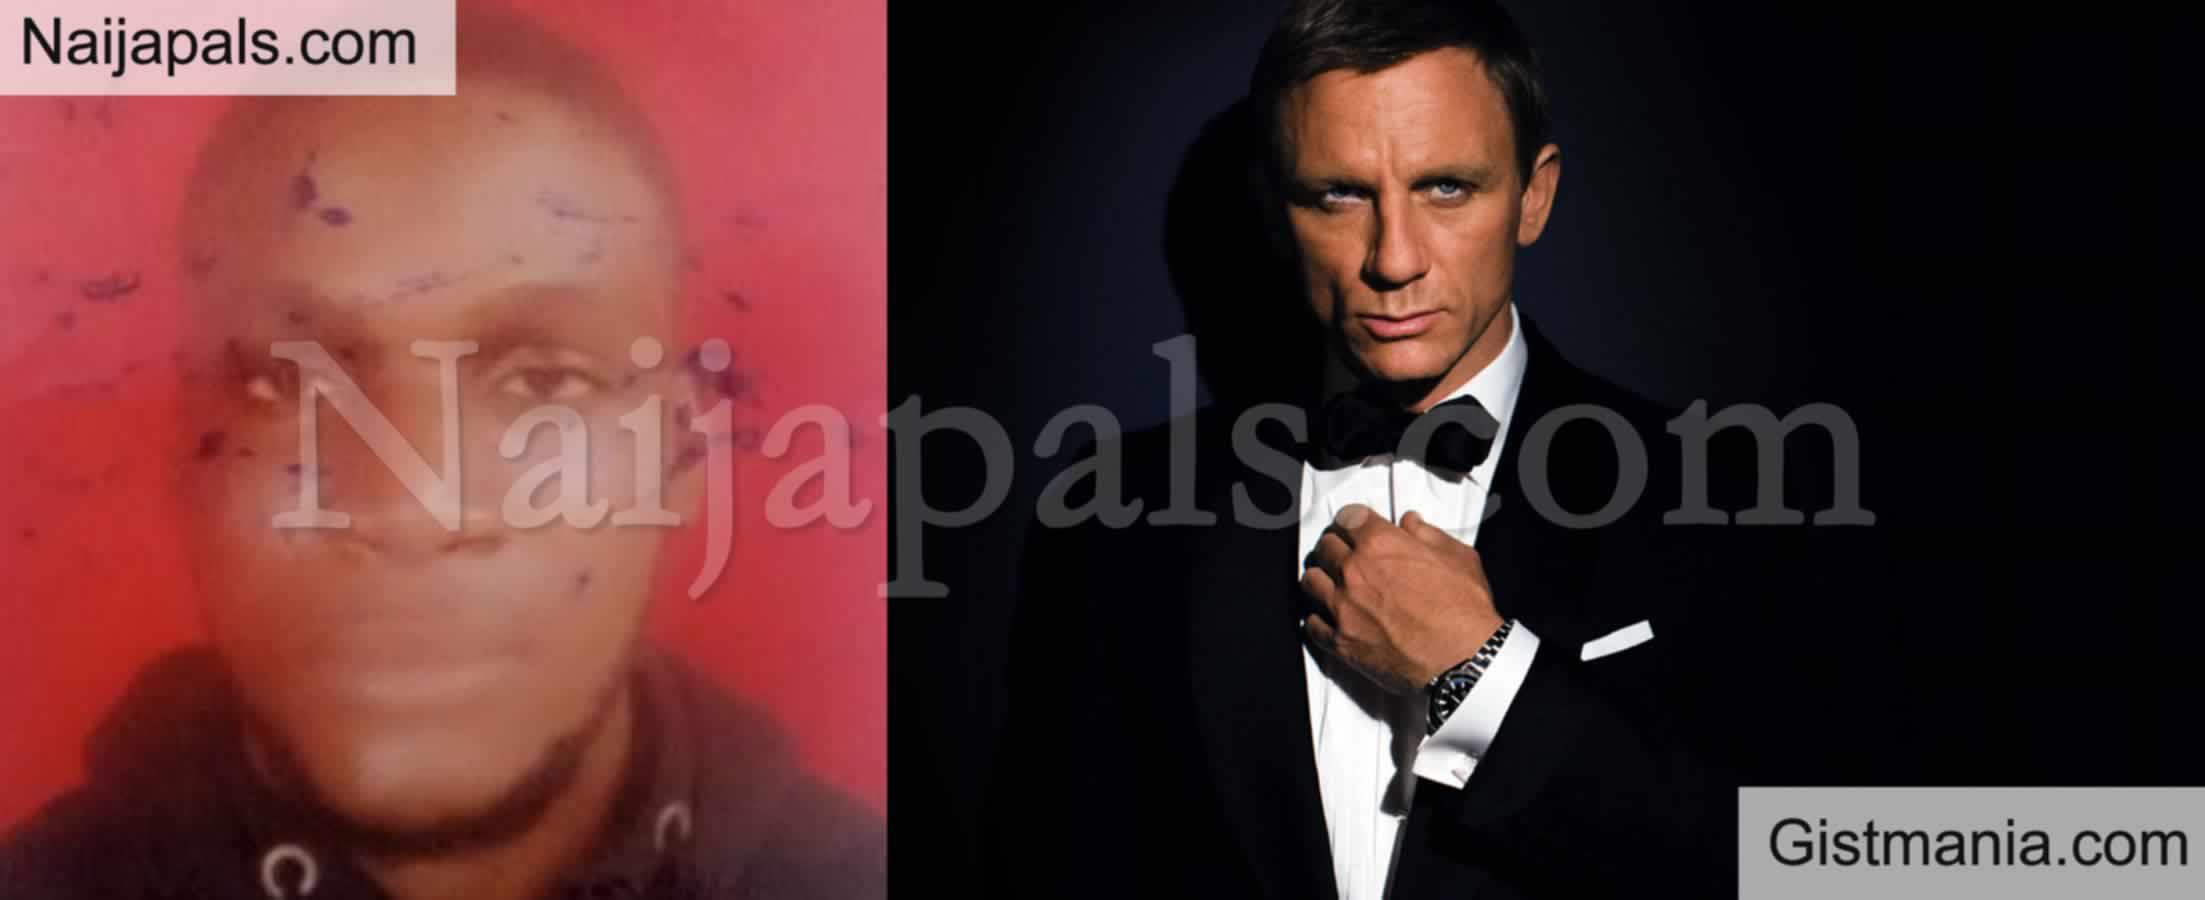 <img alt='.' class='lazyload' data-src='https://img.gistmania.com/emot/shocked.gif' /> Say What? <b>Yahoo Boy Bags 2 Year Jail Term For Impersonating James Bond Actor, Daniel Craig </b>